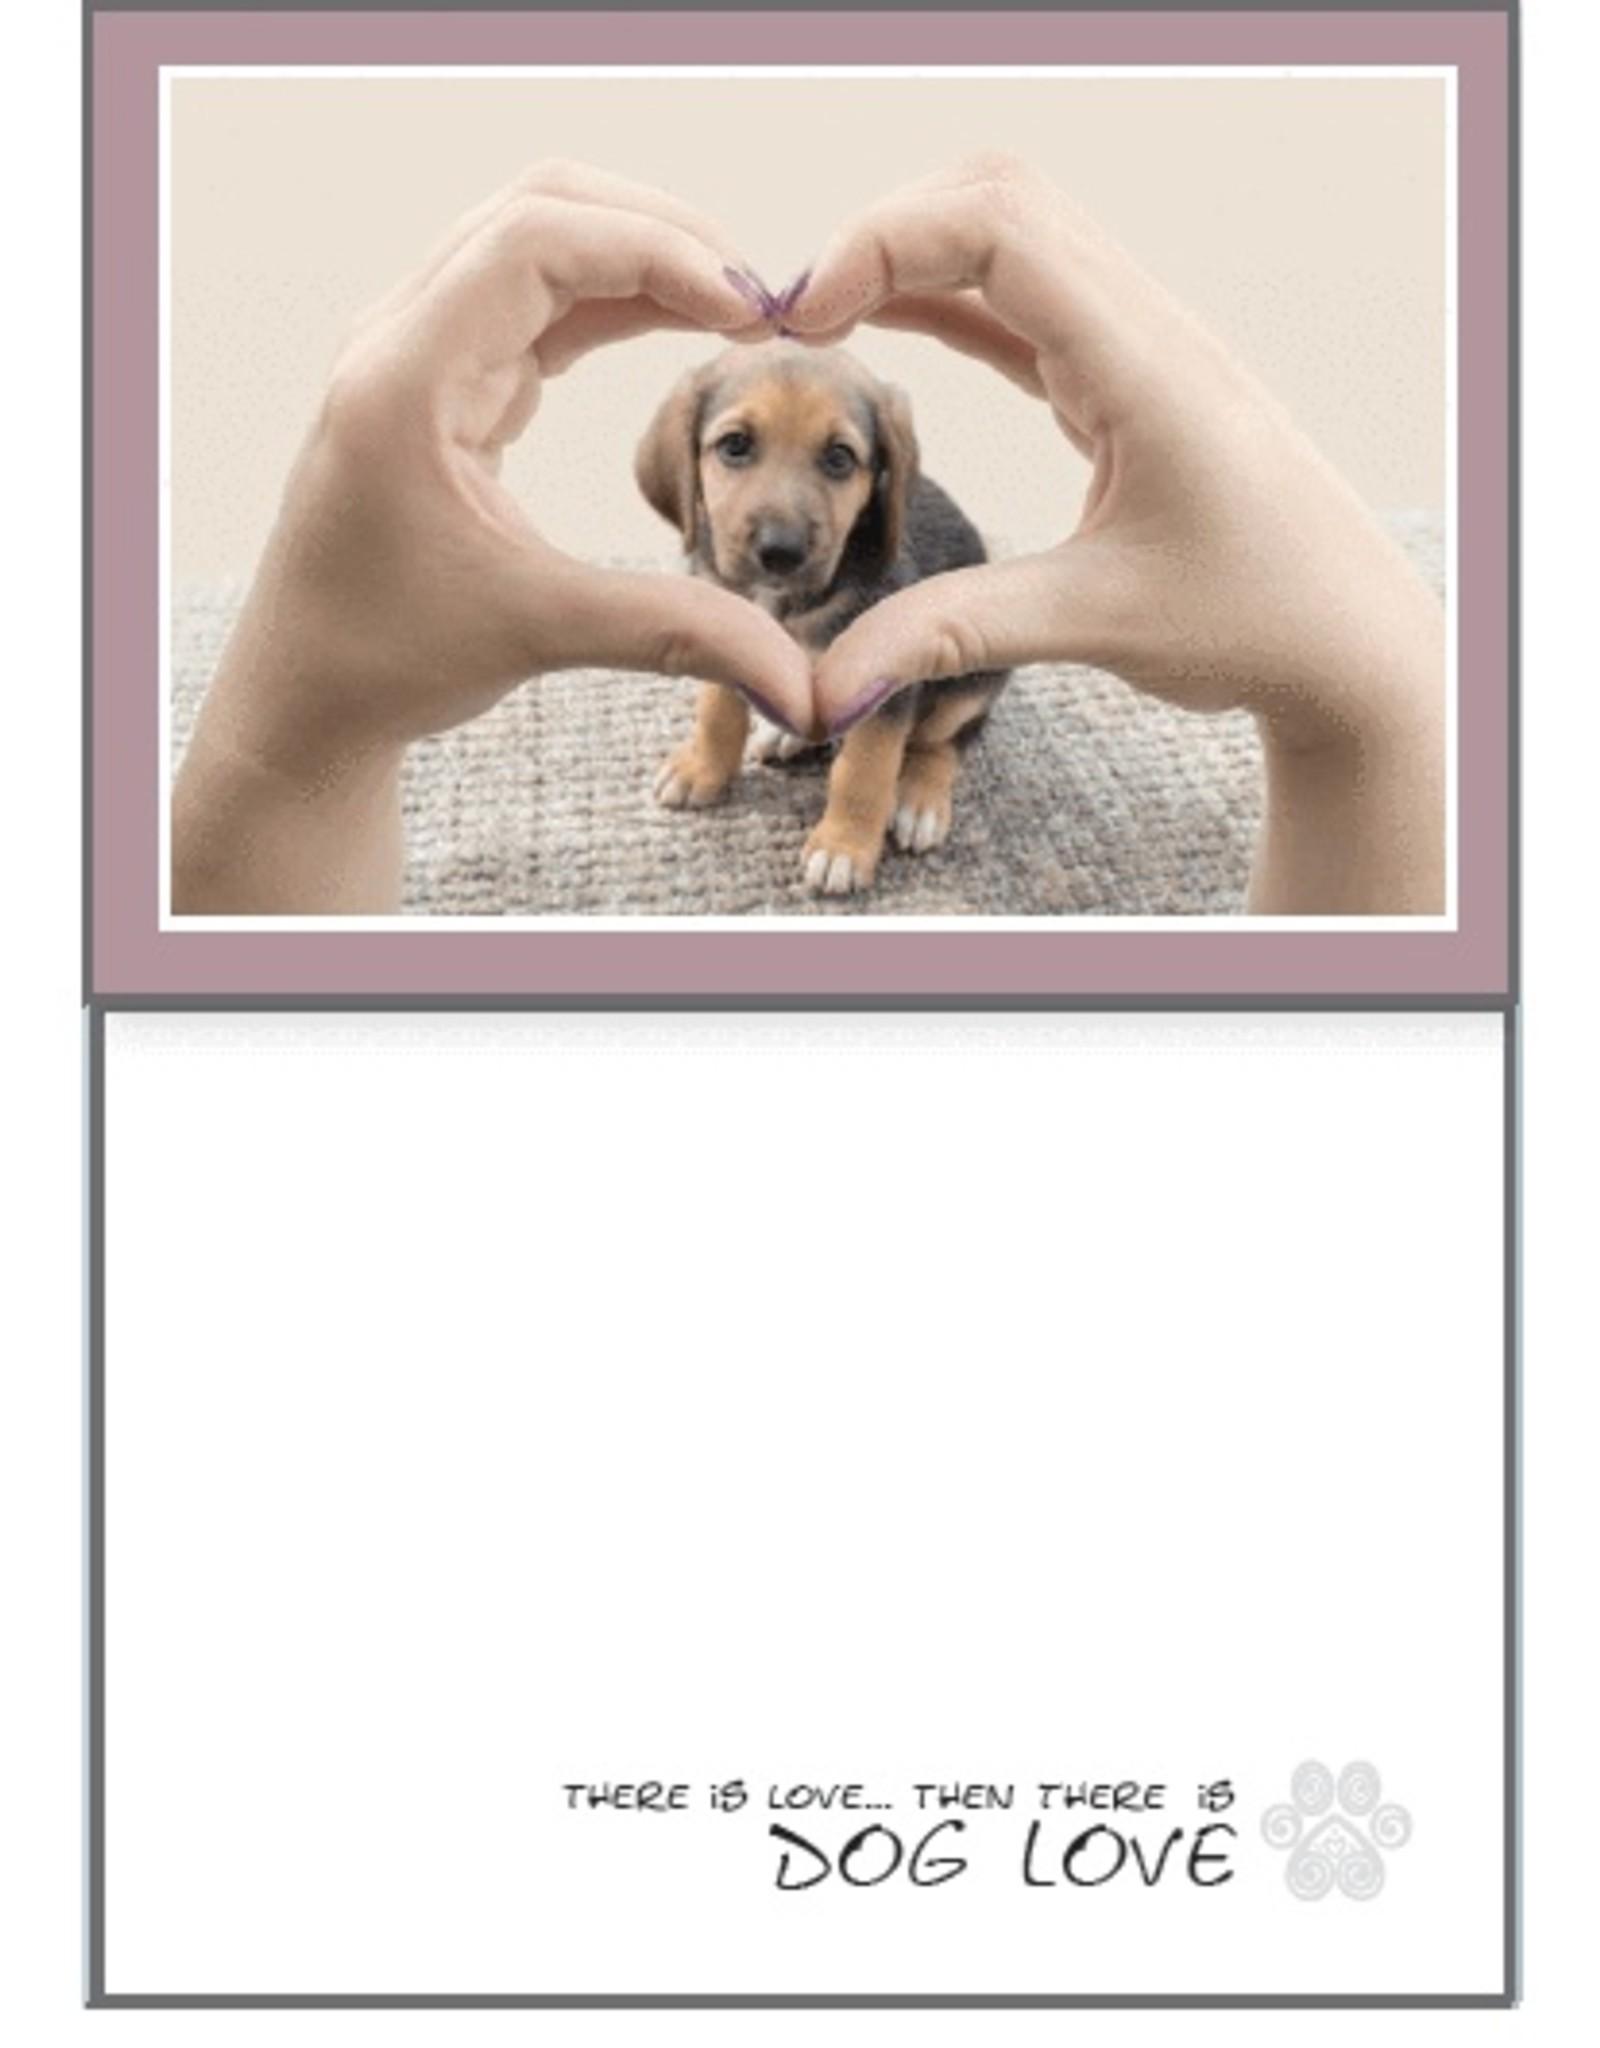 Dog Speak Dog Speak Card - Love - There is Love